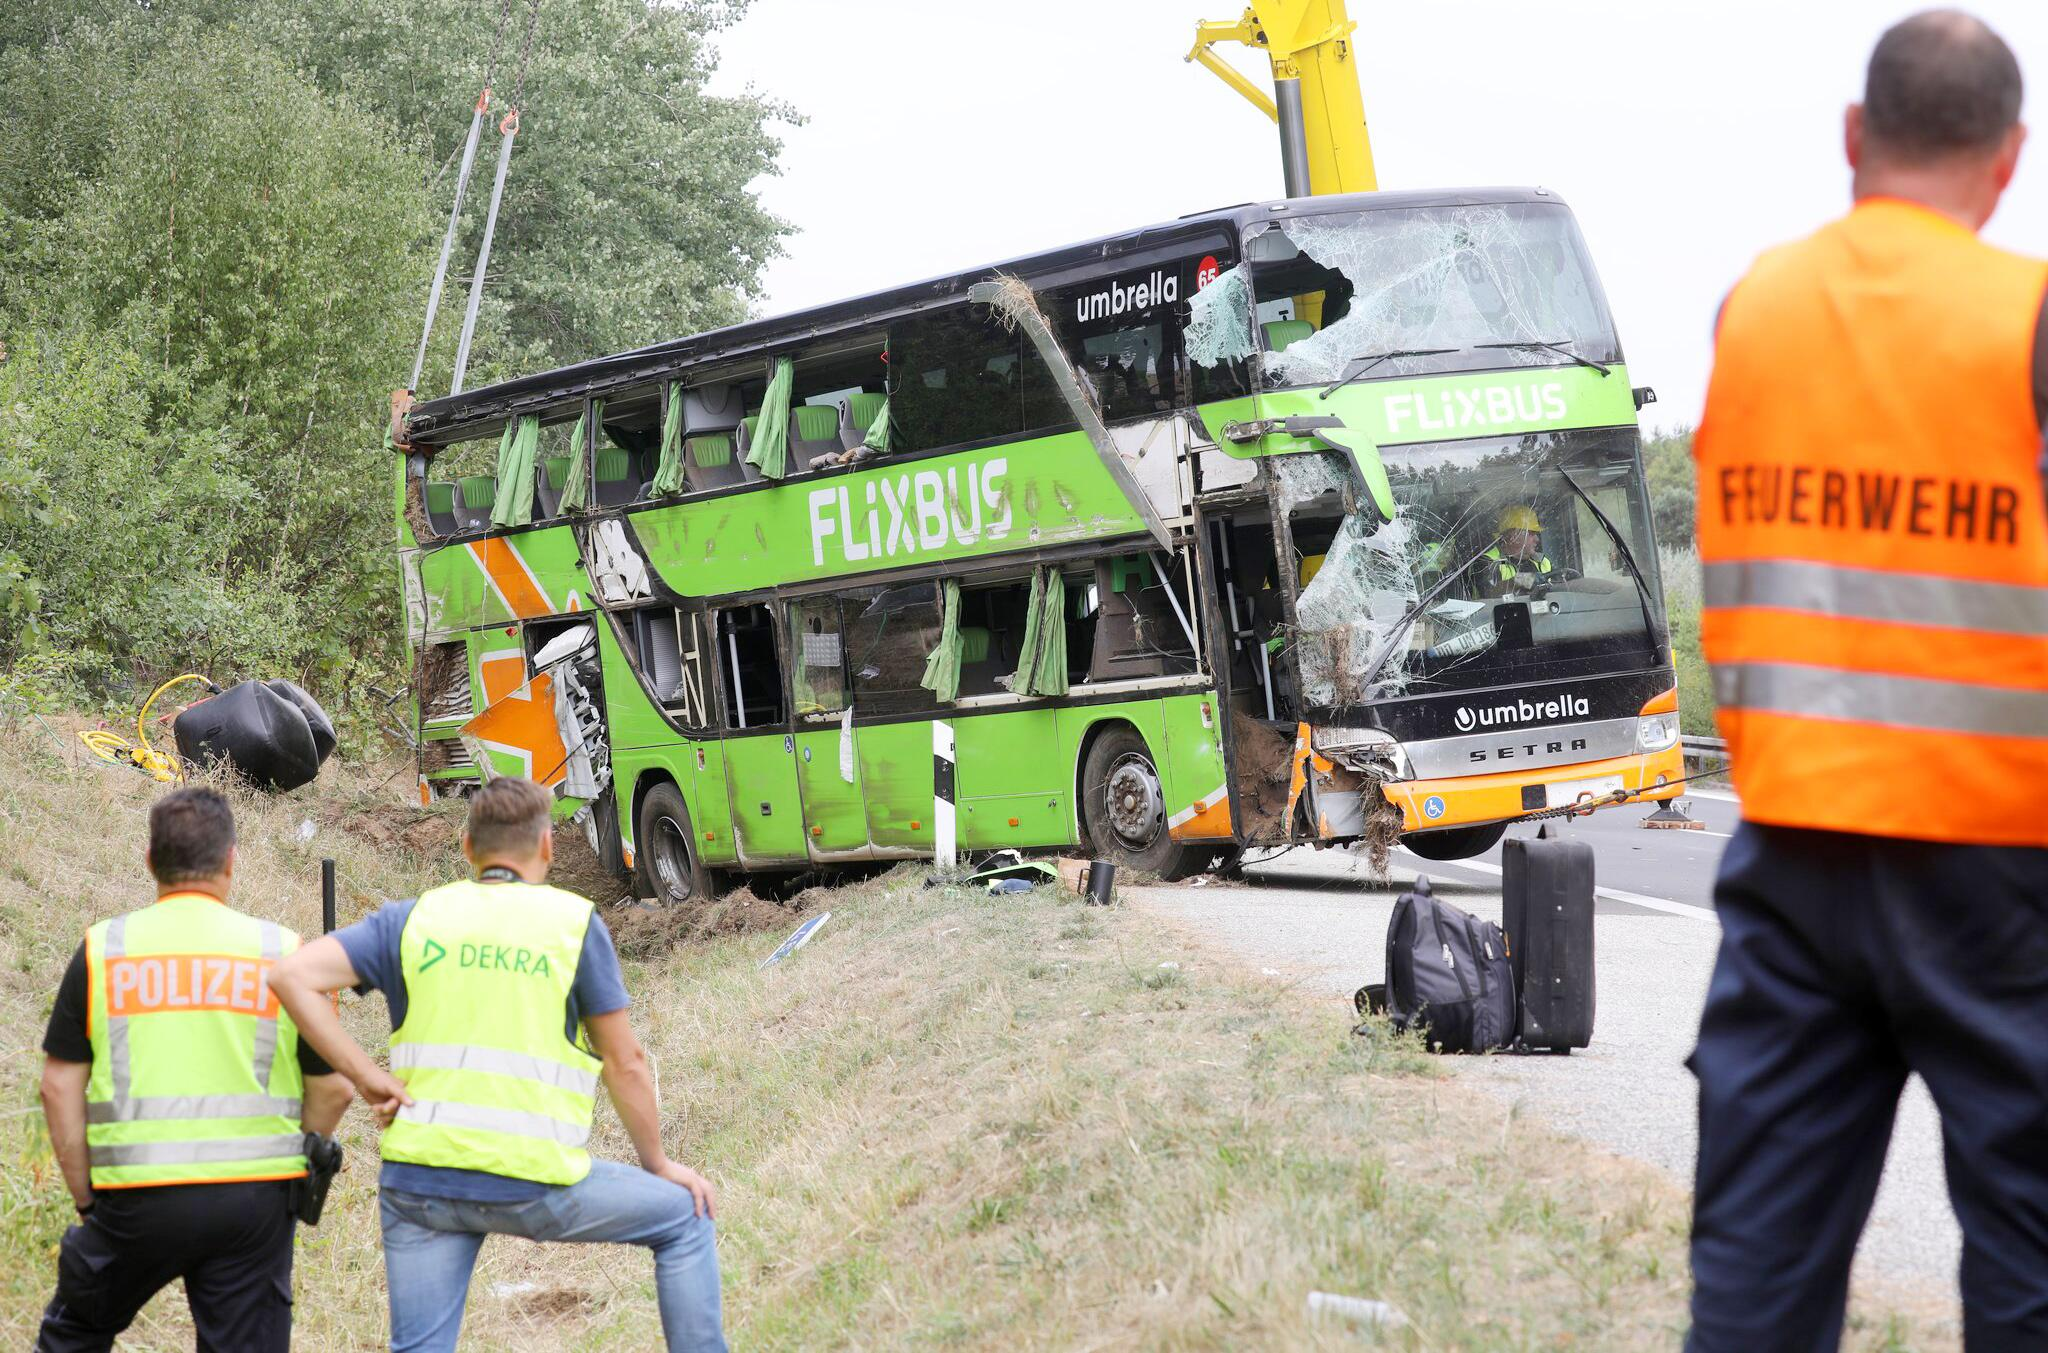 Bild zu Flixbus Unfall